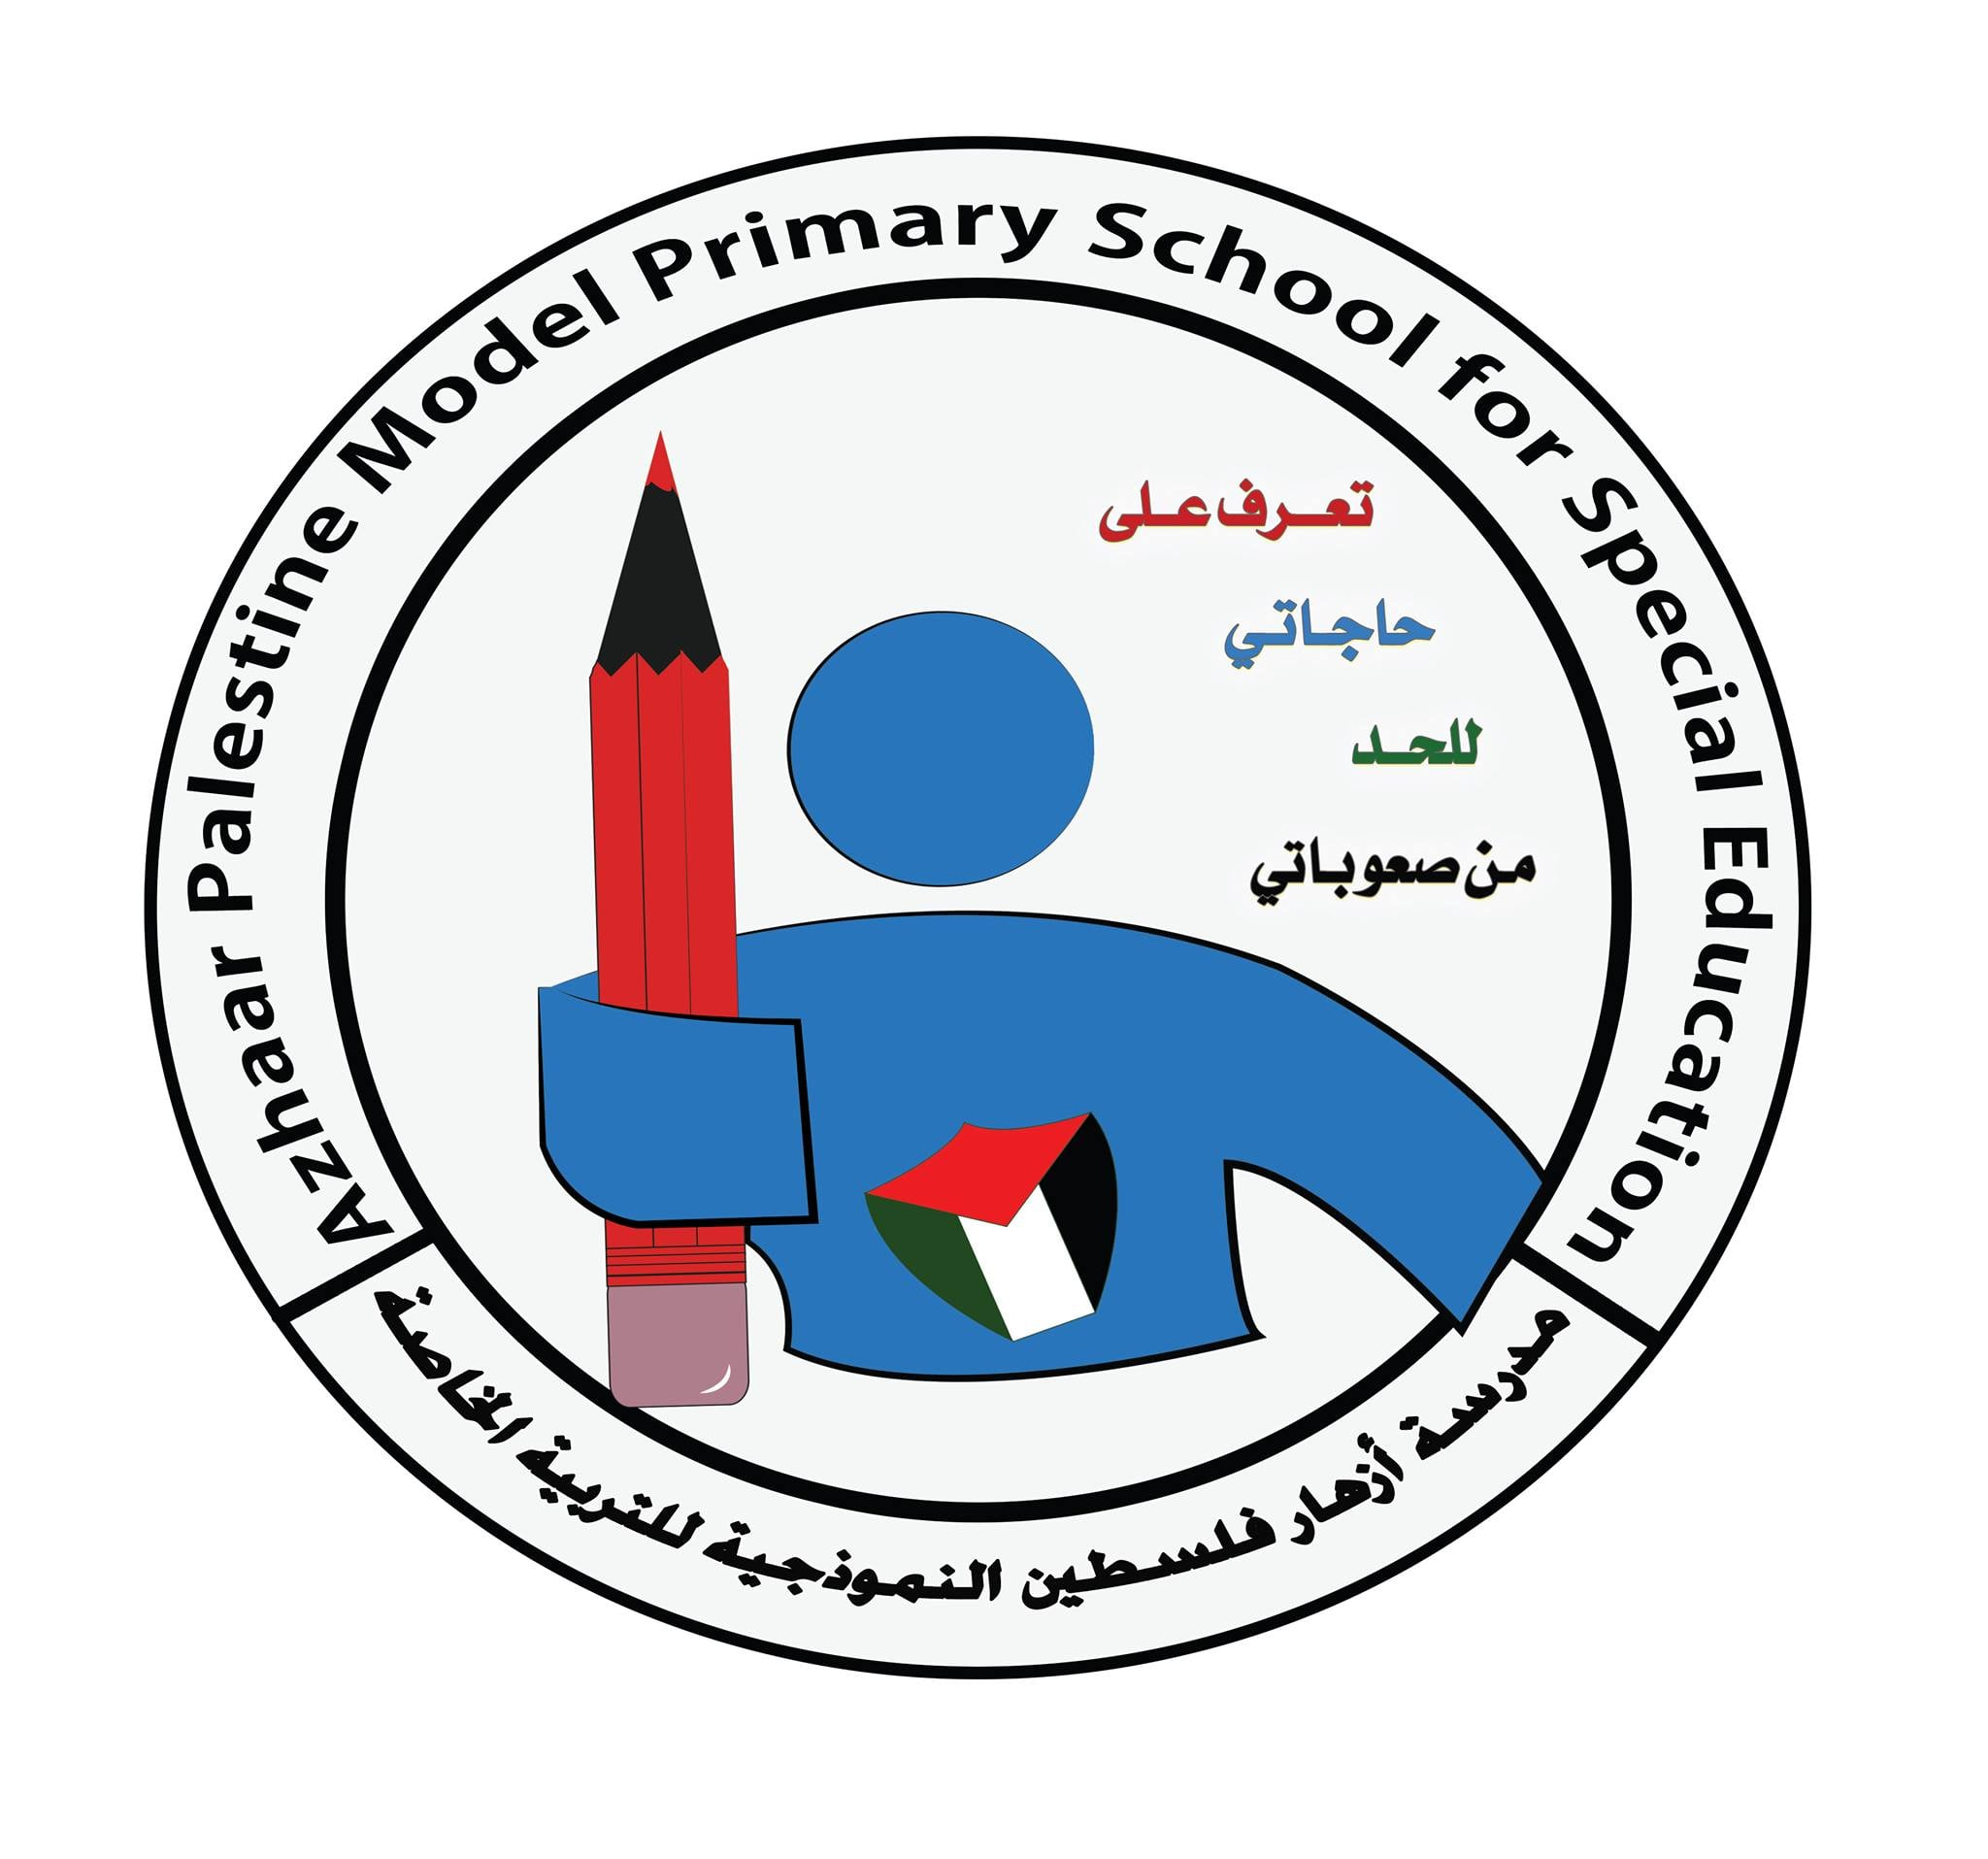 Azhar Palestine is a non-profit organization that was established in 2016